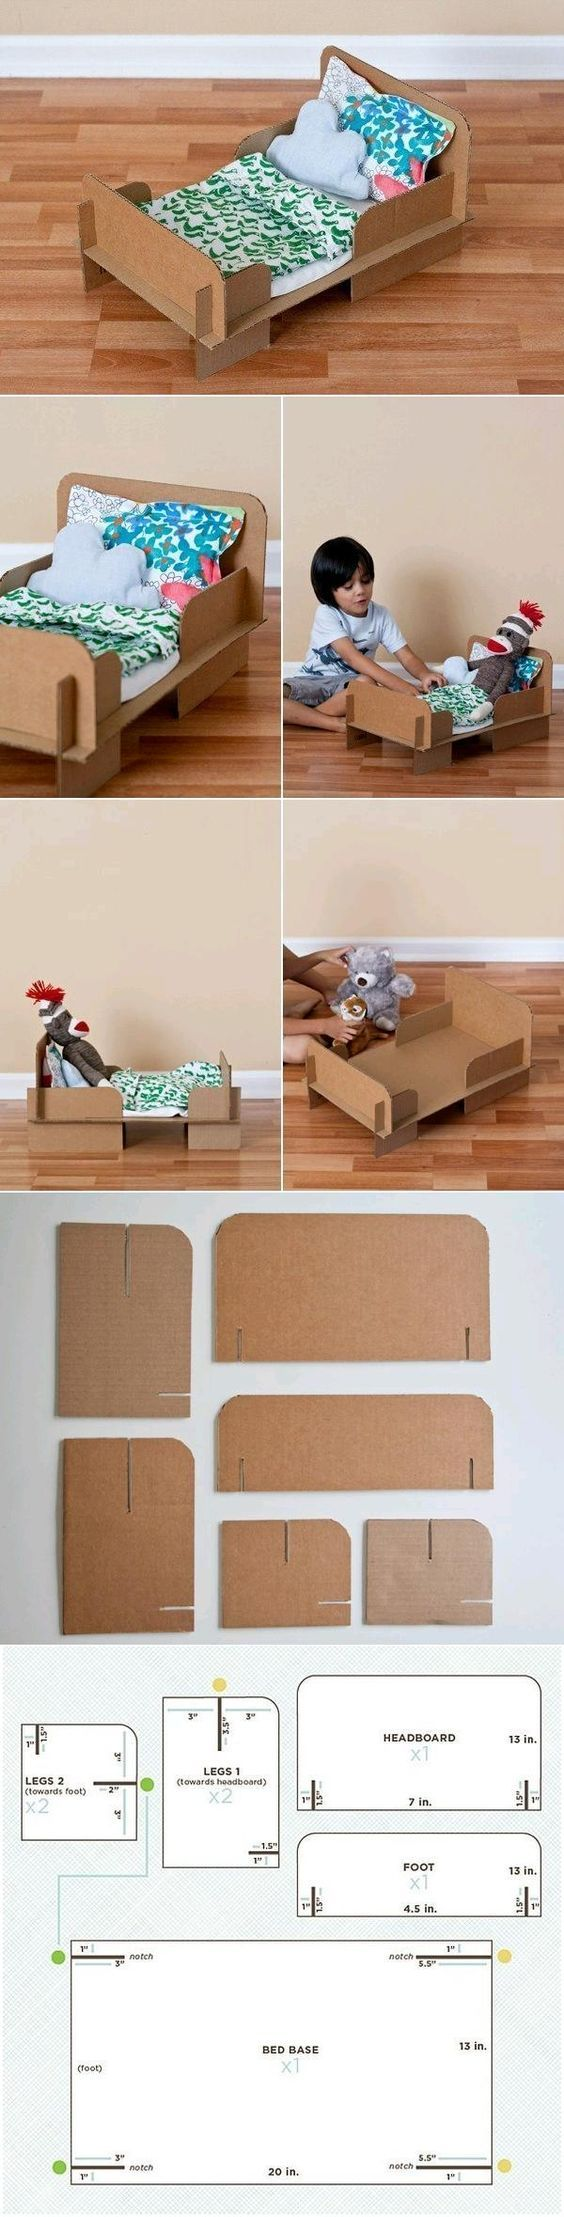 DIY Cardboard Bed: